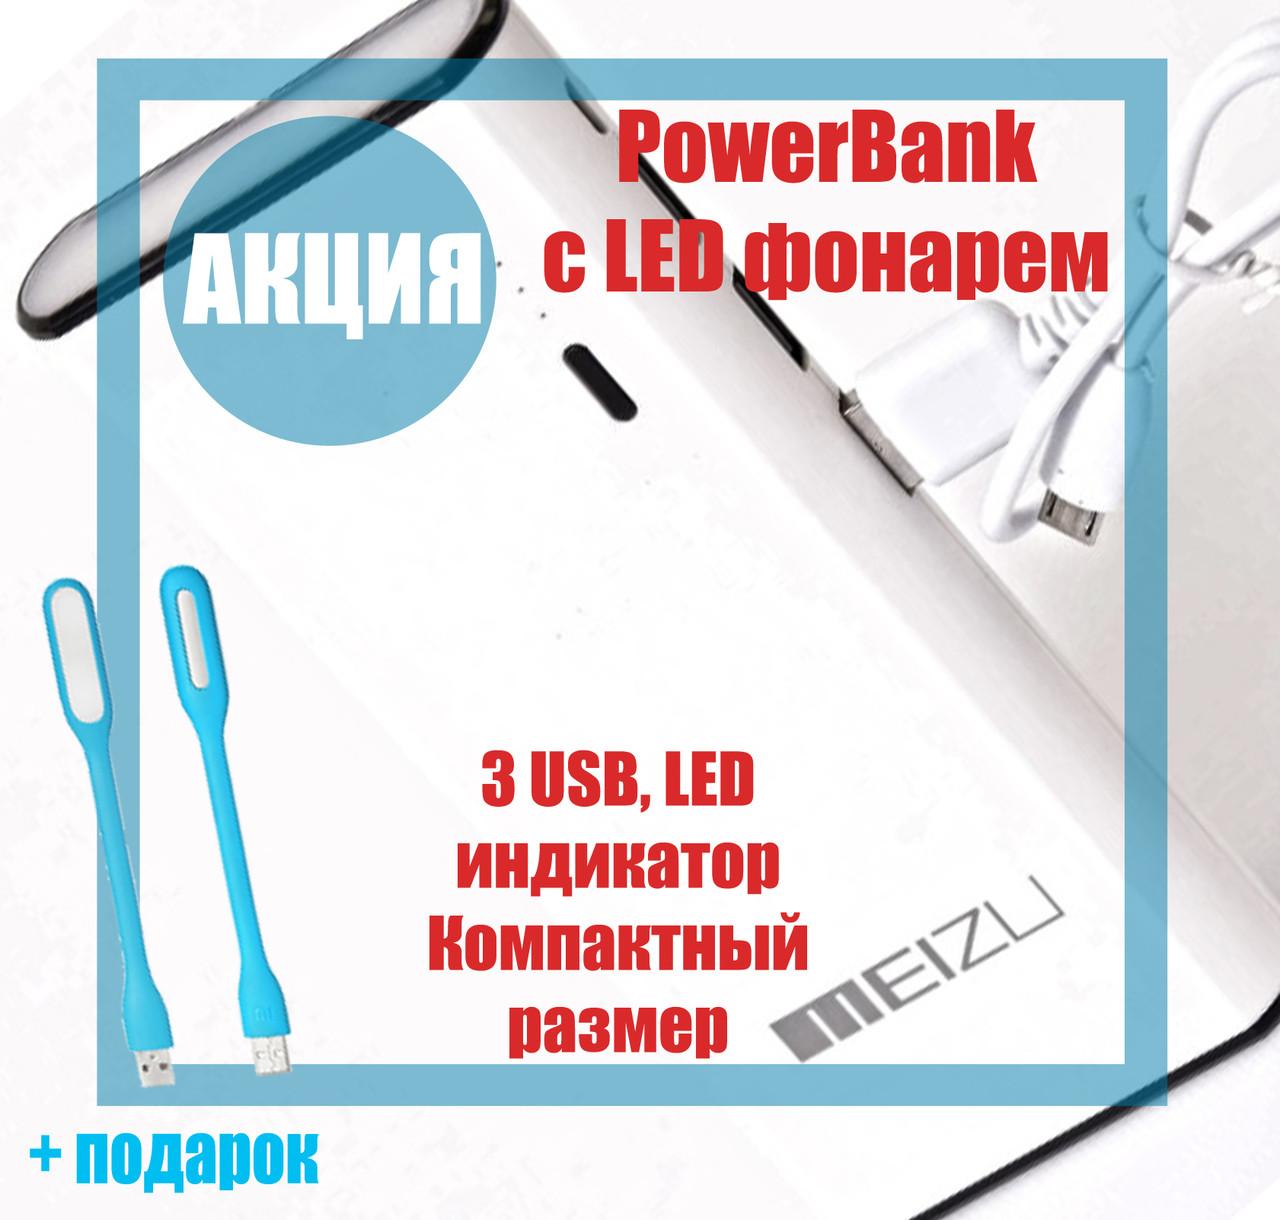 Внешний аккумулятор Power Bank Meizu 30000 mAh 3USB+LED фонарь - батарея, QualitiReplica